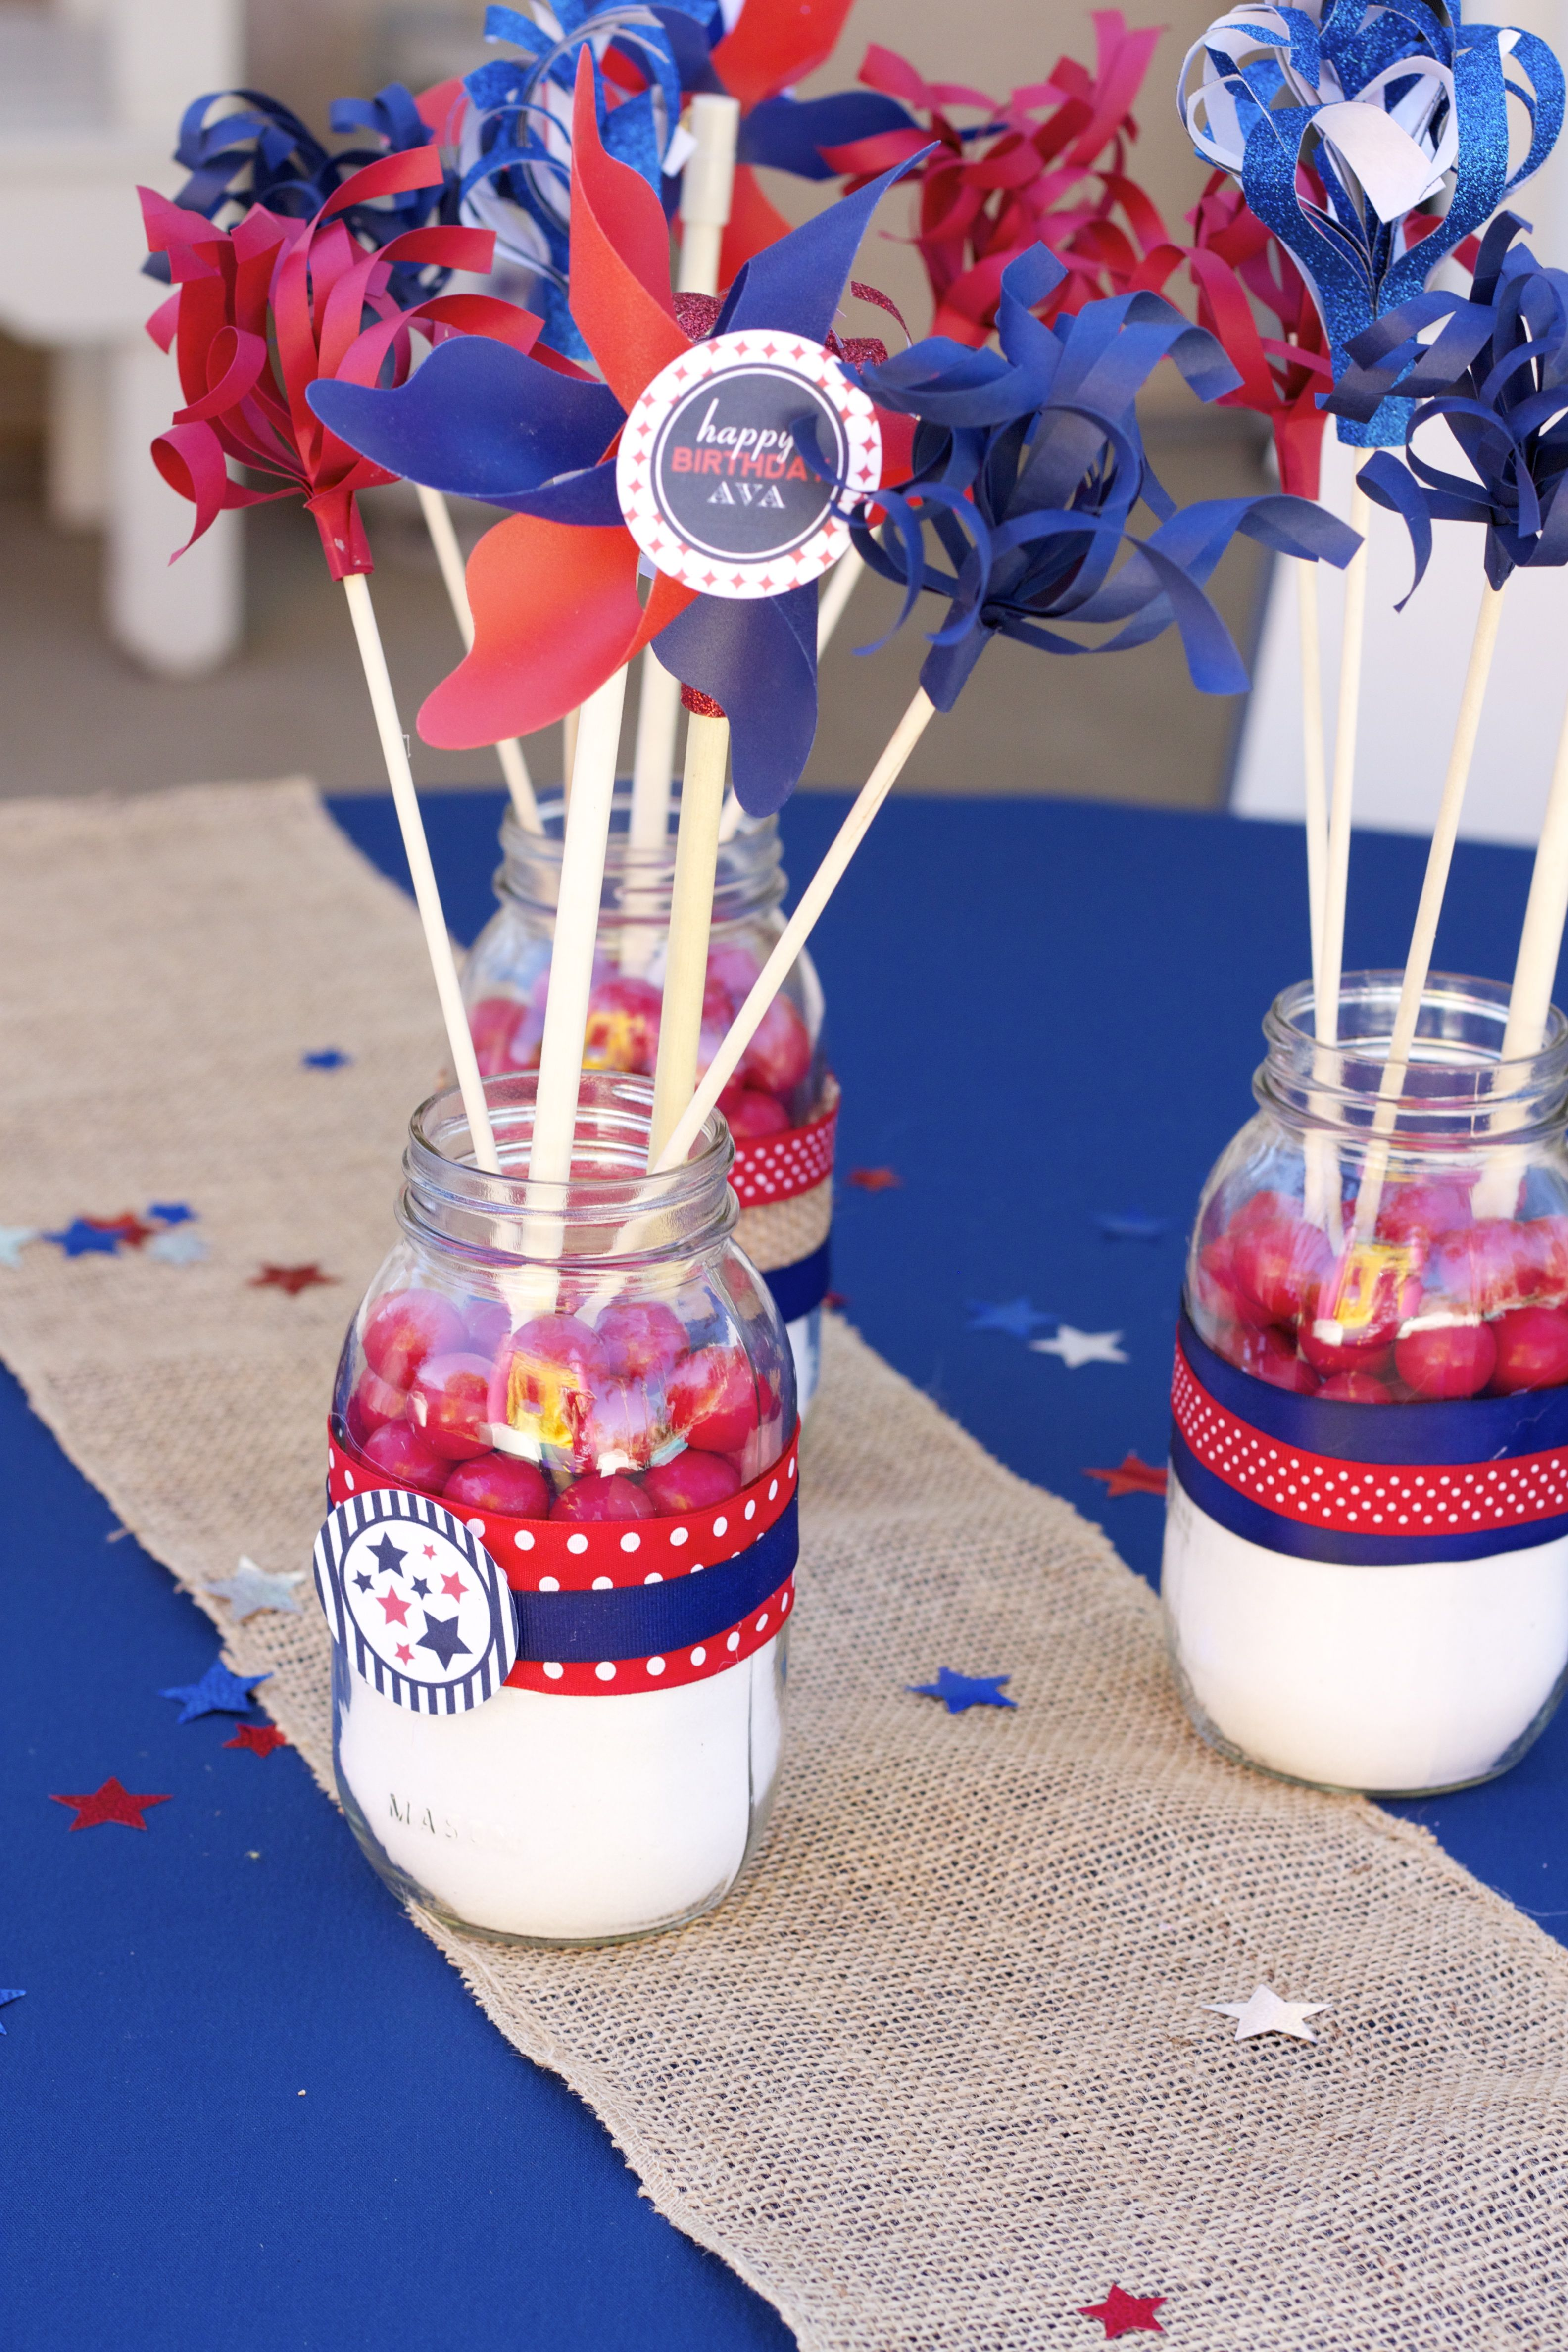 Mason Jar Centerpieces With Homemade Firework Sticks And Pinwheels